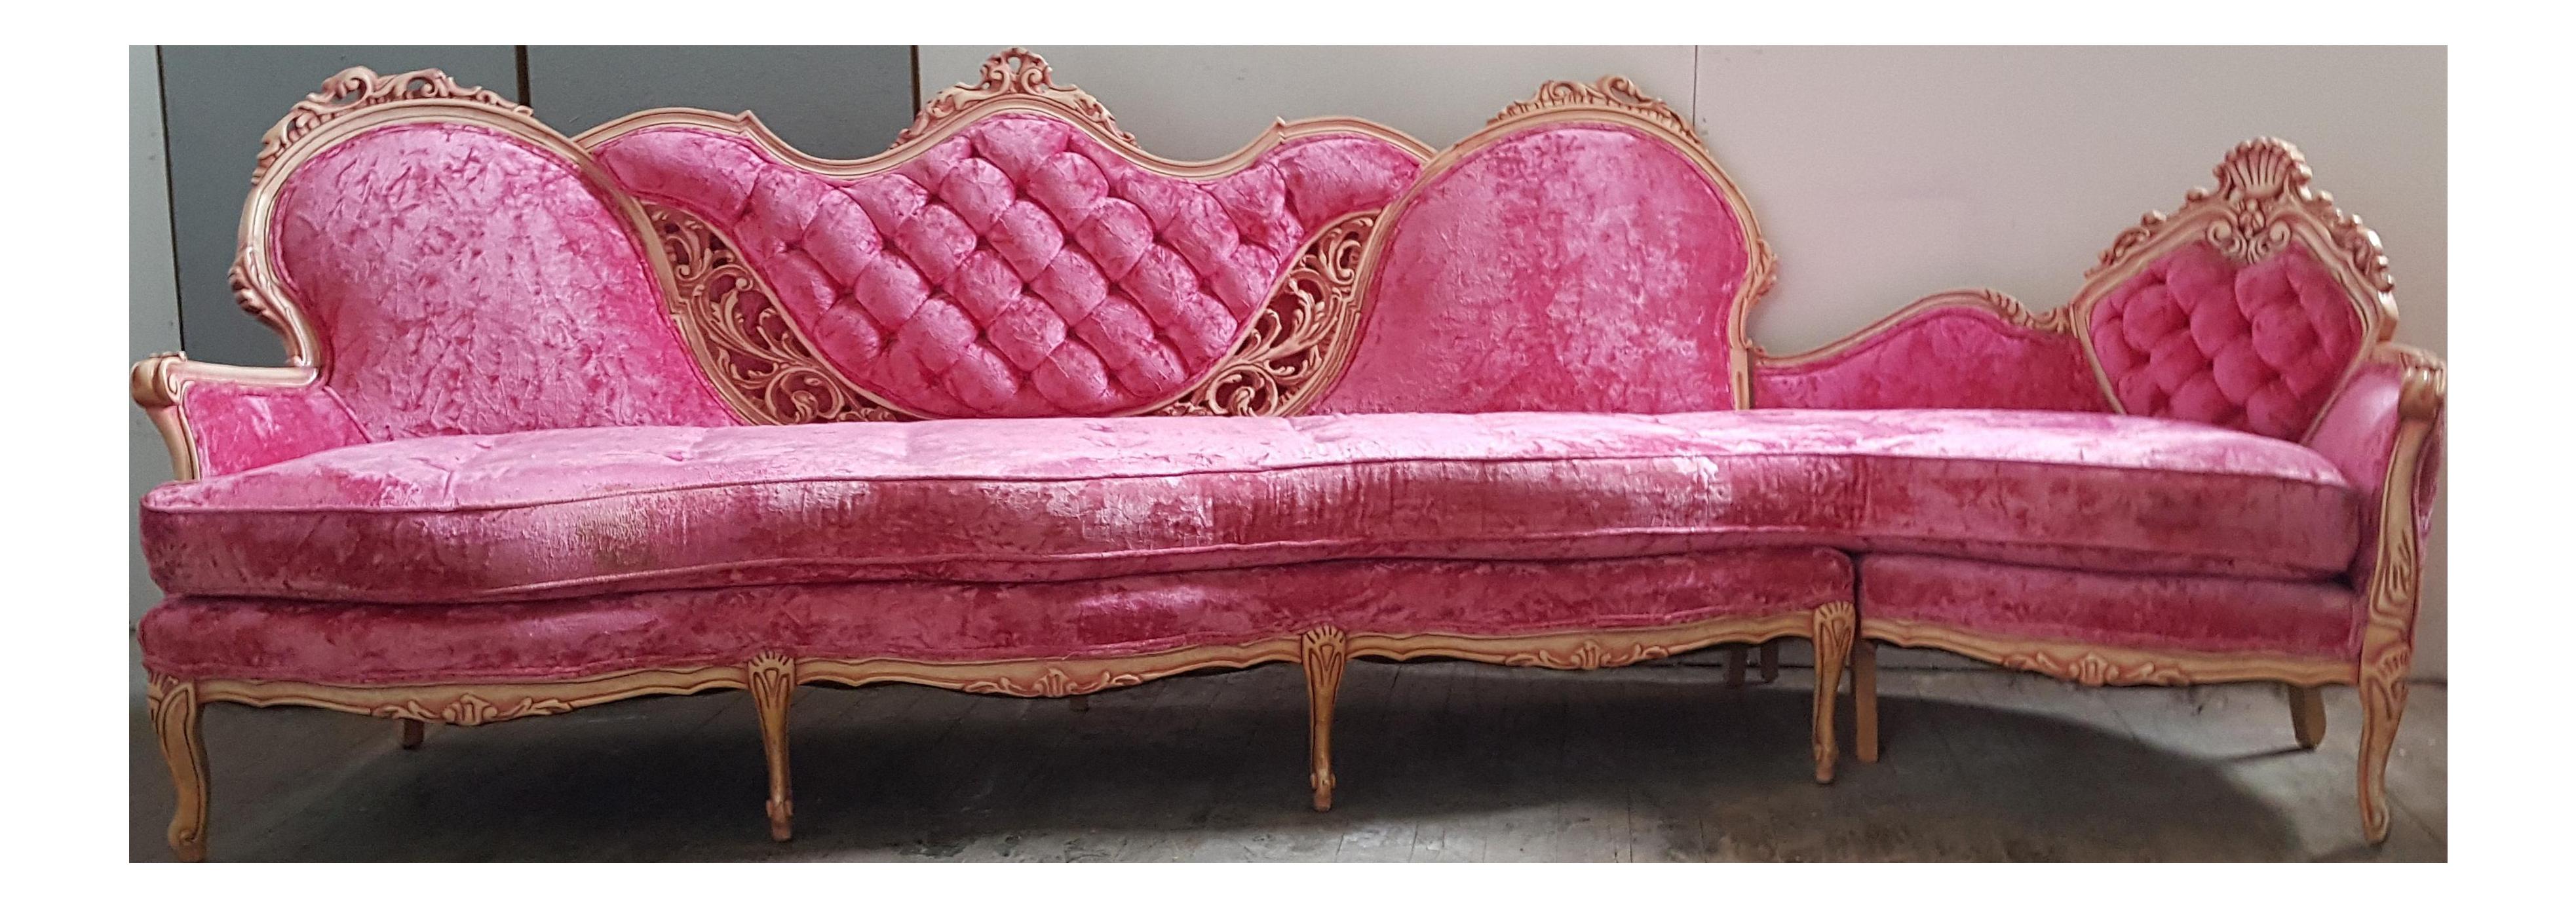 Vintage French Provincial Pink Velvet Sectional